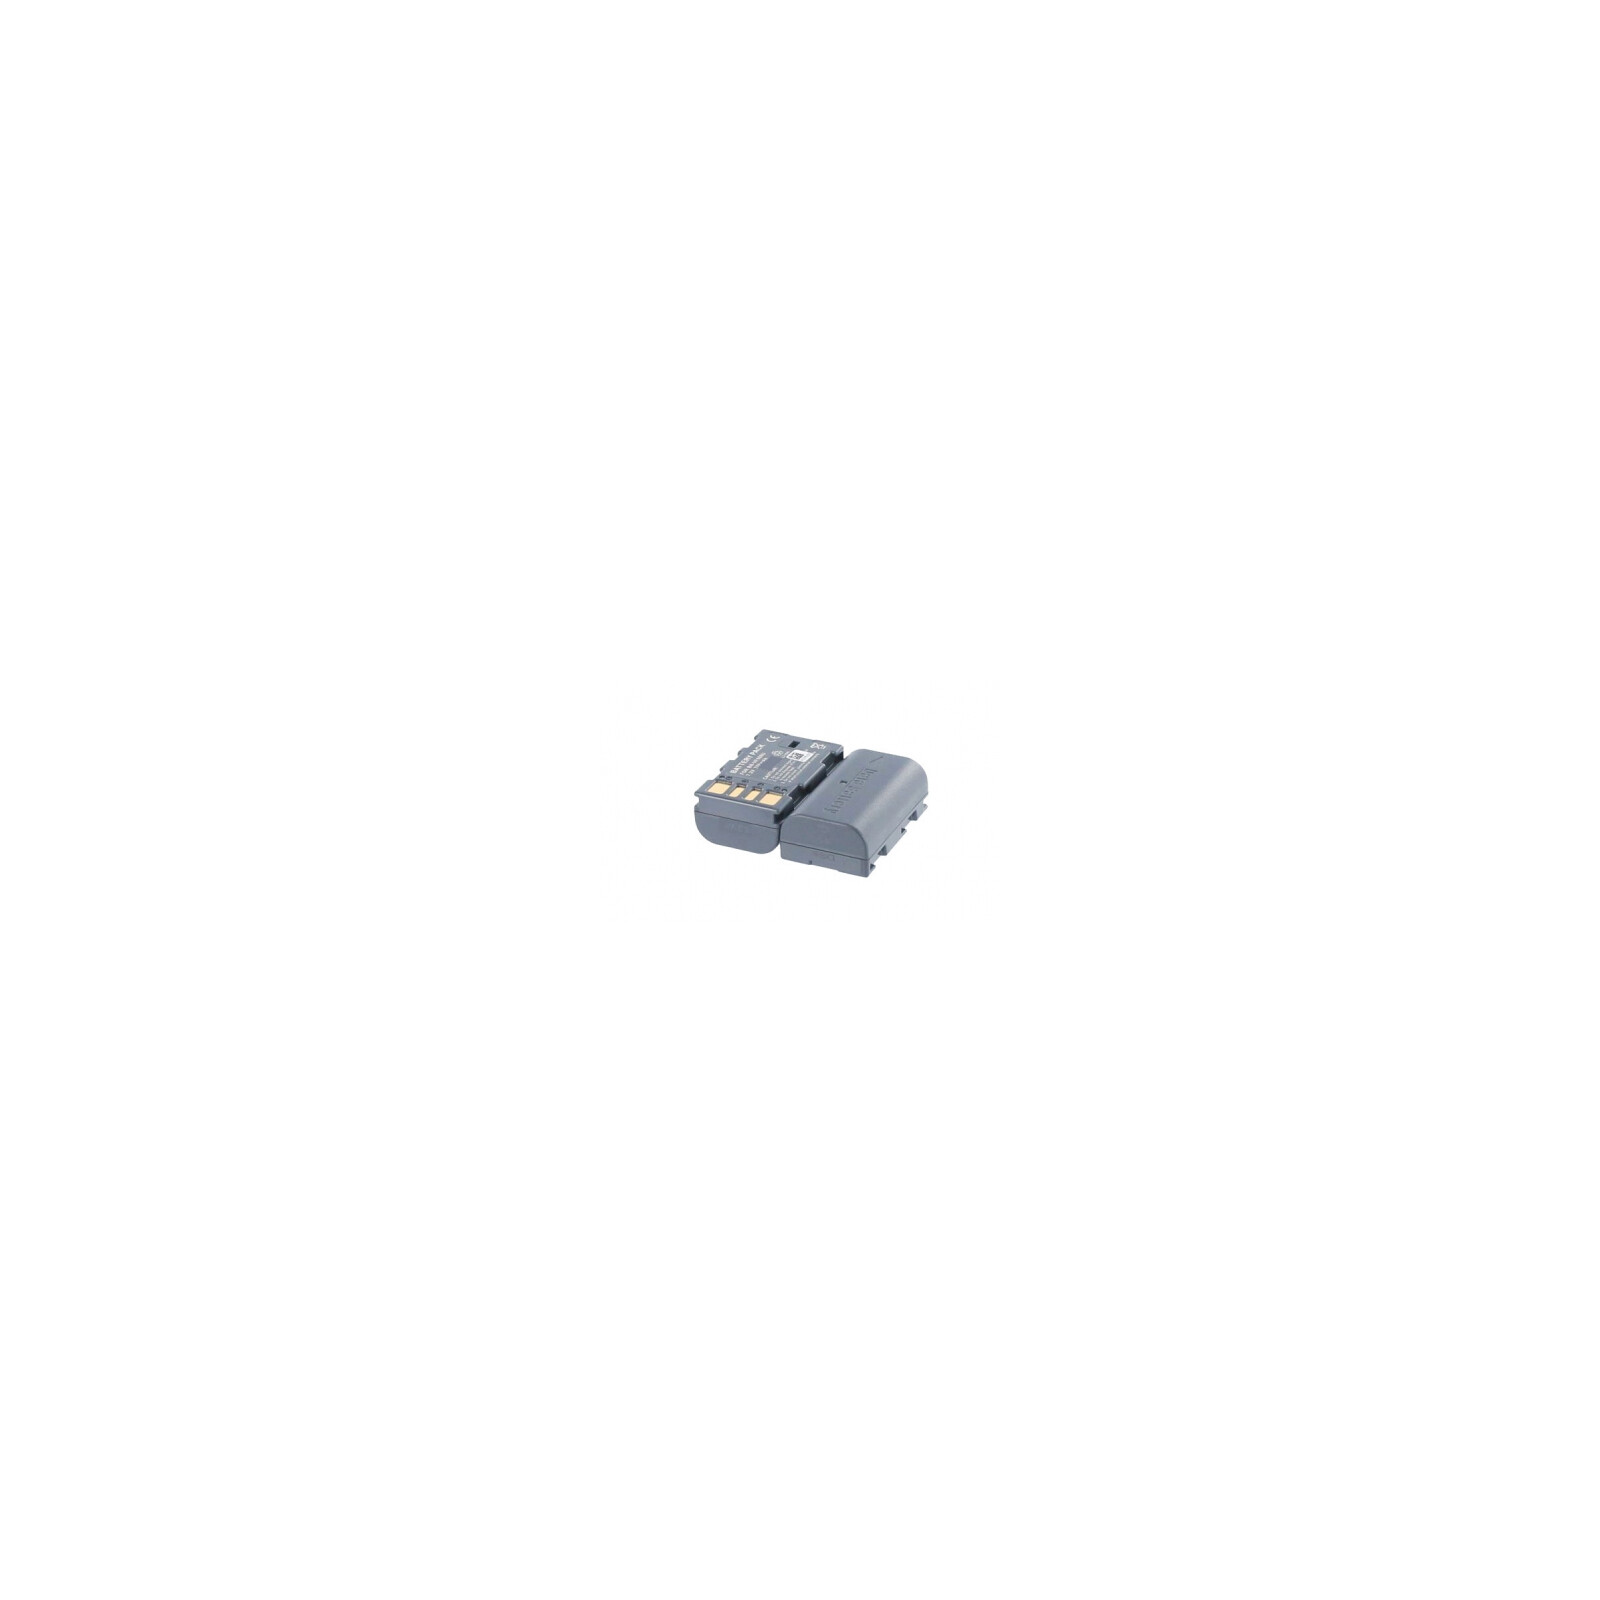 AGI 22029 JVC Everio GZ-HD30